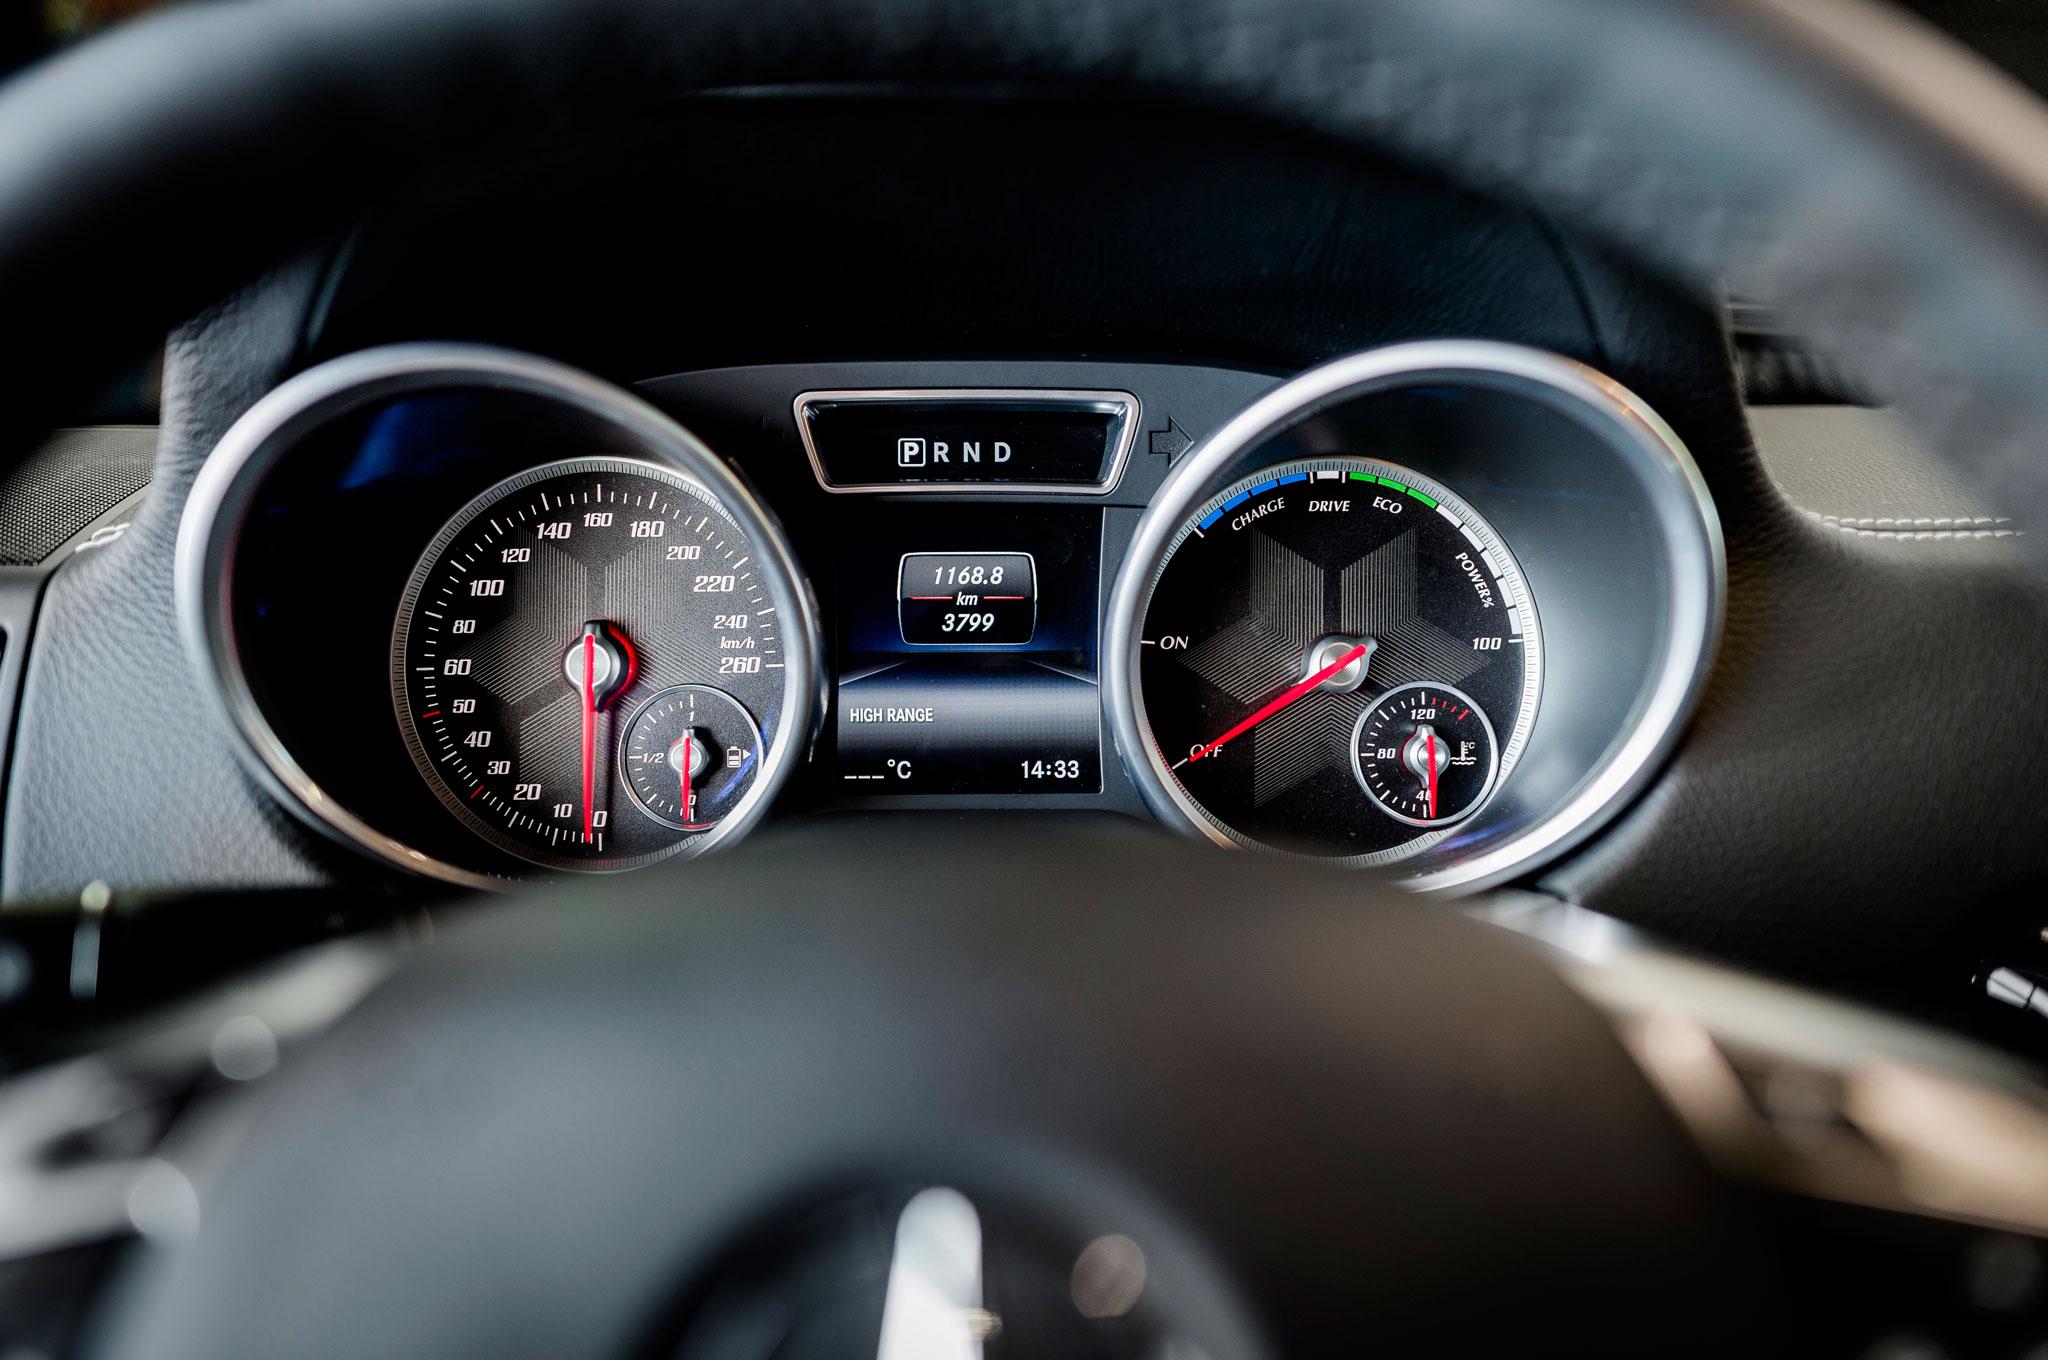 arnold schwarzenegger kreisel electric g wagen gauges